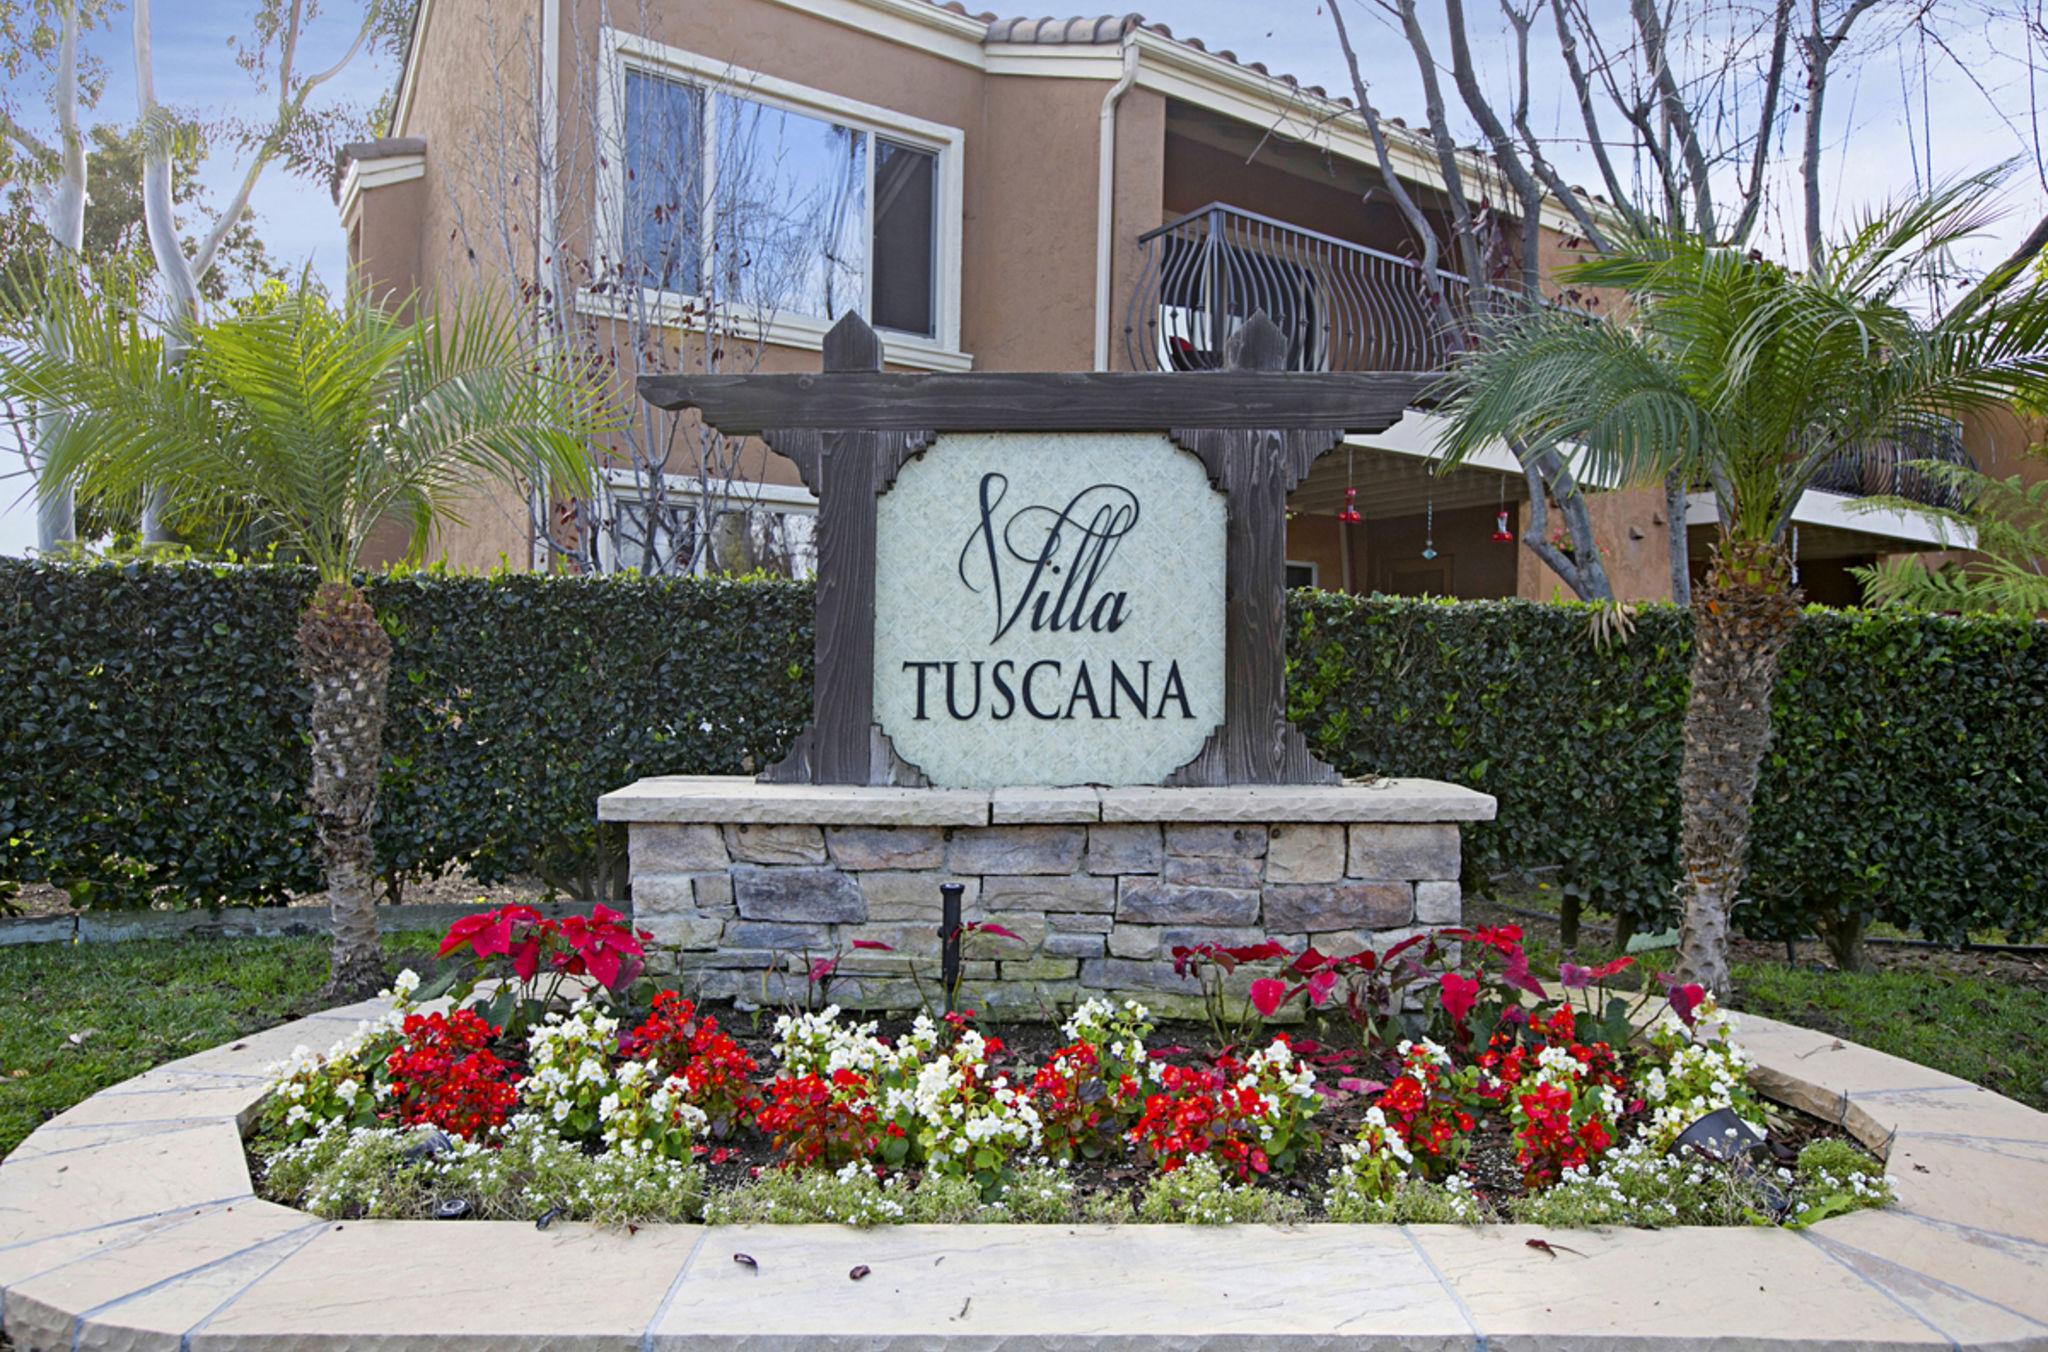 7ljc6c tuscana 32274460765 o web ipad pro